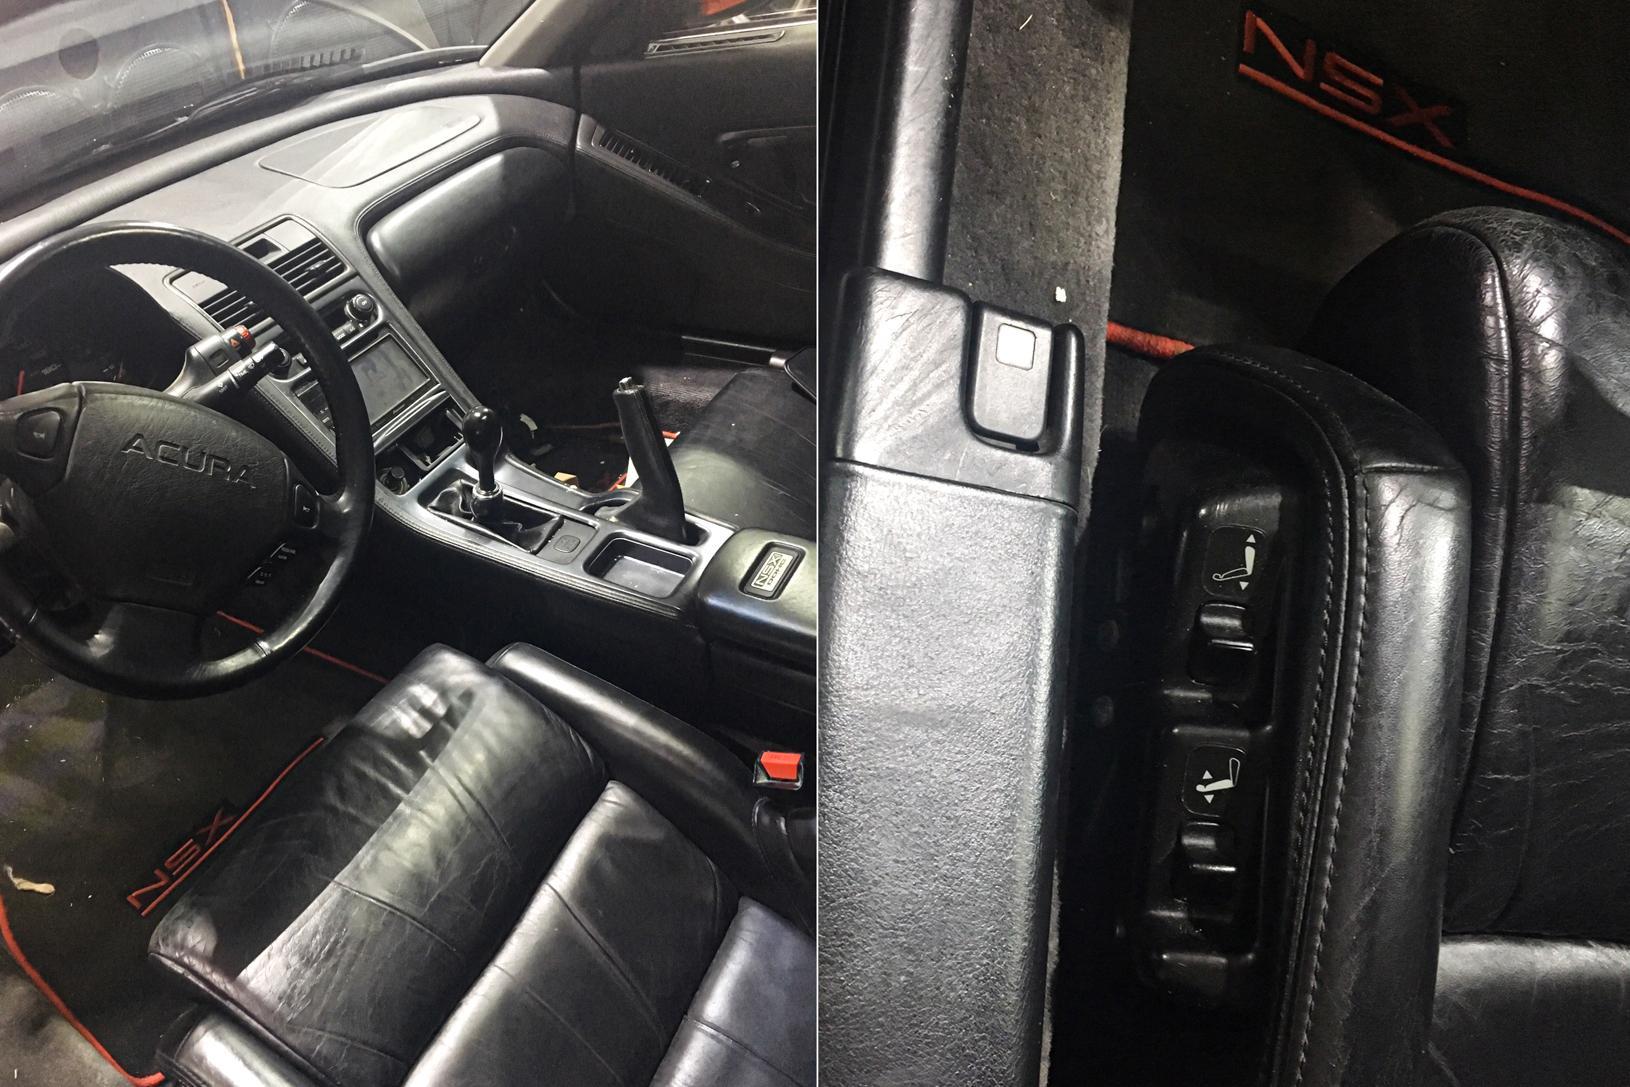 1993 Acura NSX